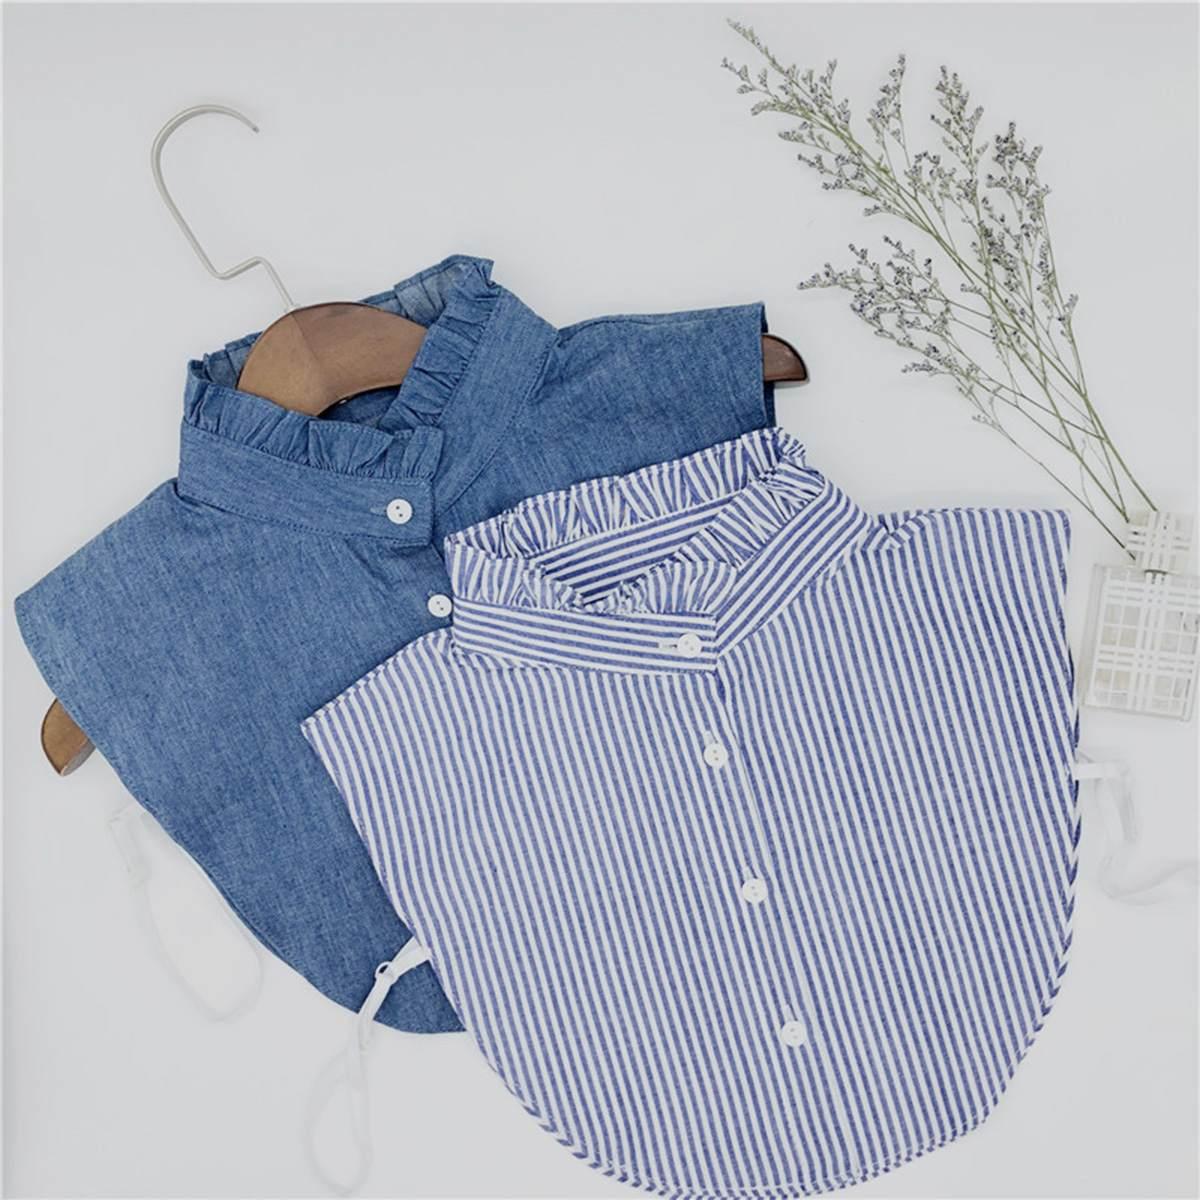 Shirt Fake Collar Women Detachable Blue Fake Lapel Blouse Top Striped Blue Jeans Half Shirts False Collar Clothes Accessories